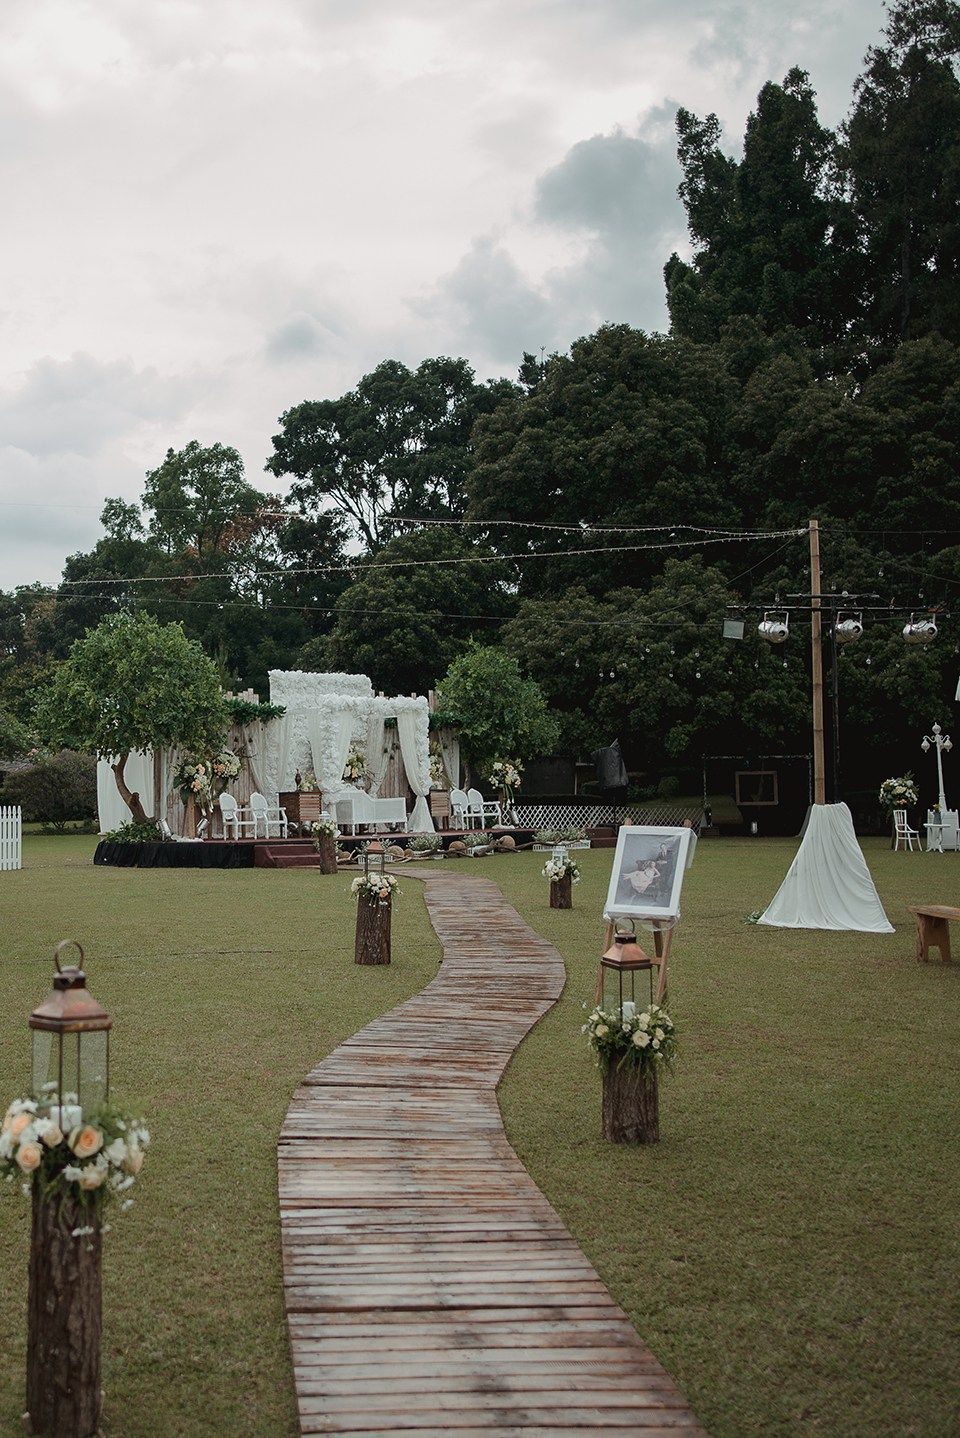 Pernikahan Outdoor Rustic Garden Party di Bandung the